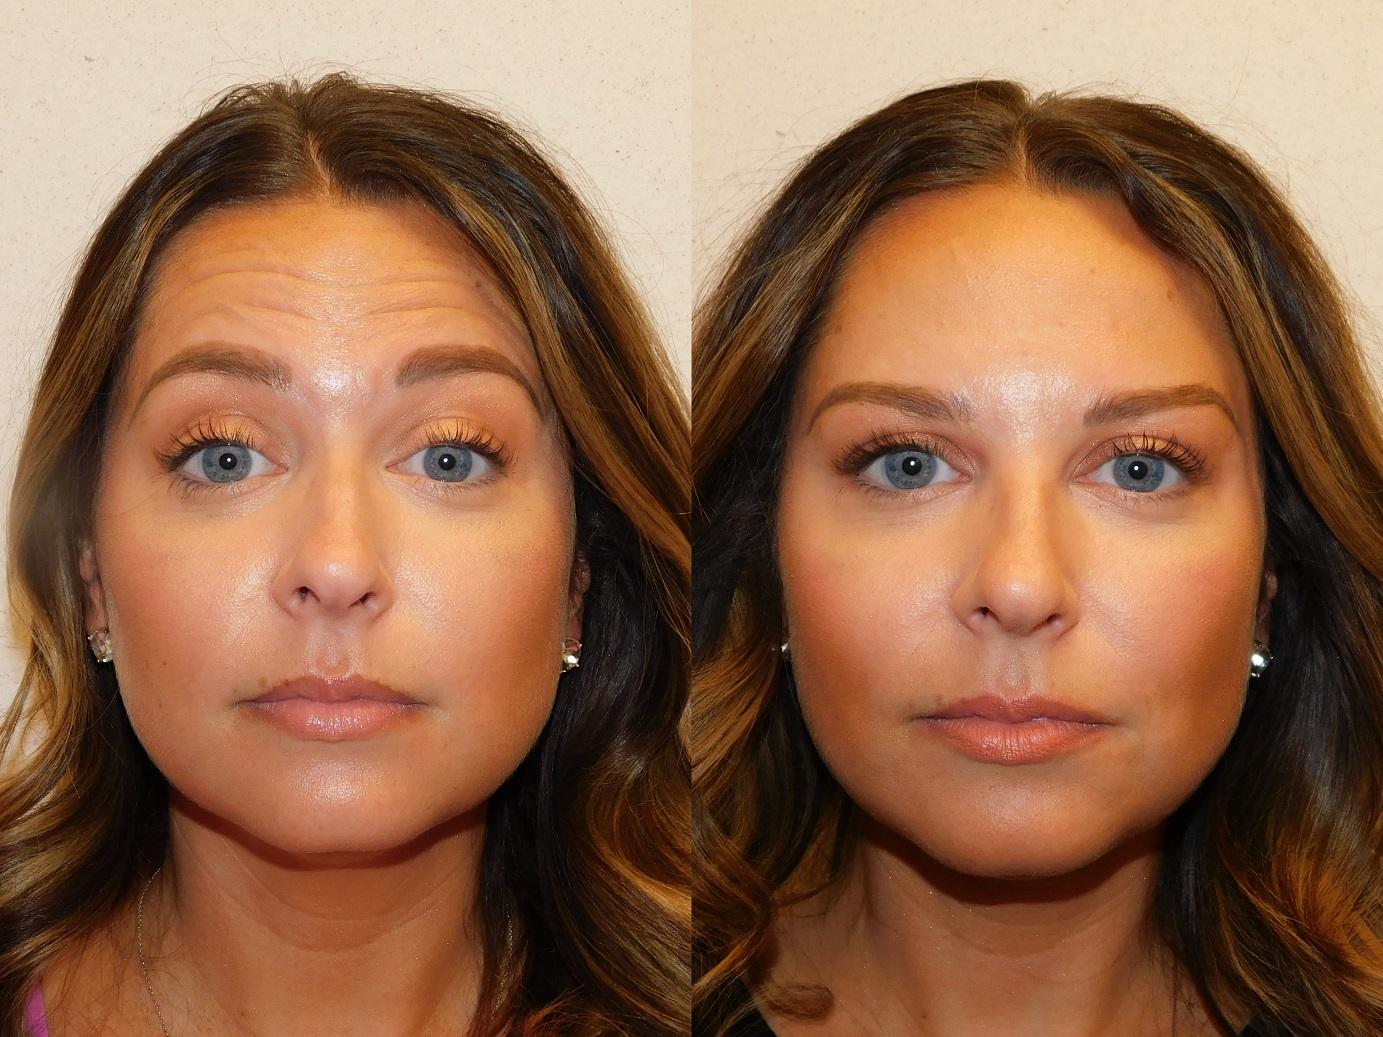 Botox results-Jeuveau-#NEWTOX-Dr. Joel Schlessinger-LovelySkin Omaha-Omaha Blogger-Omaha Beauty Blogger-Beauty Blog Post-Botox Results-Sabby Style-9